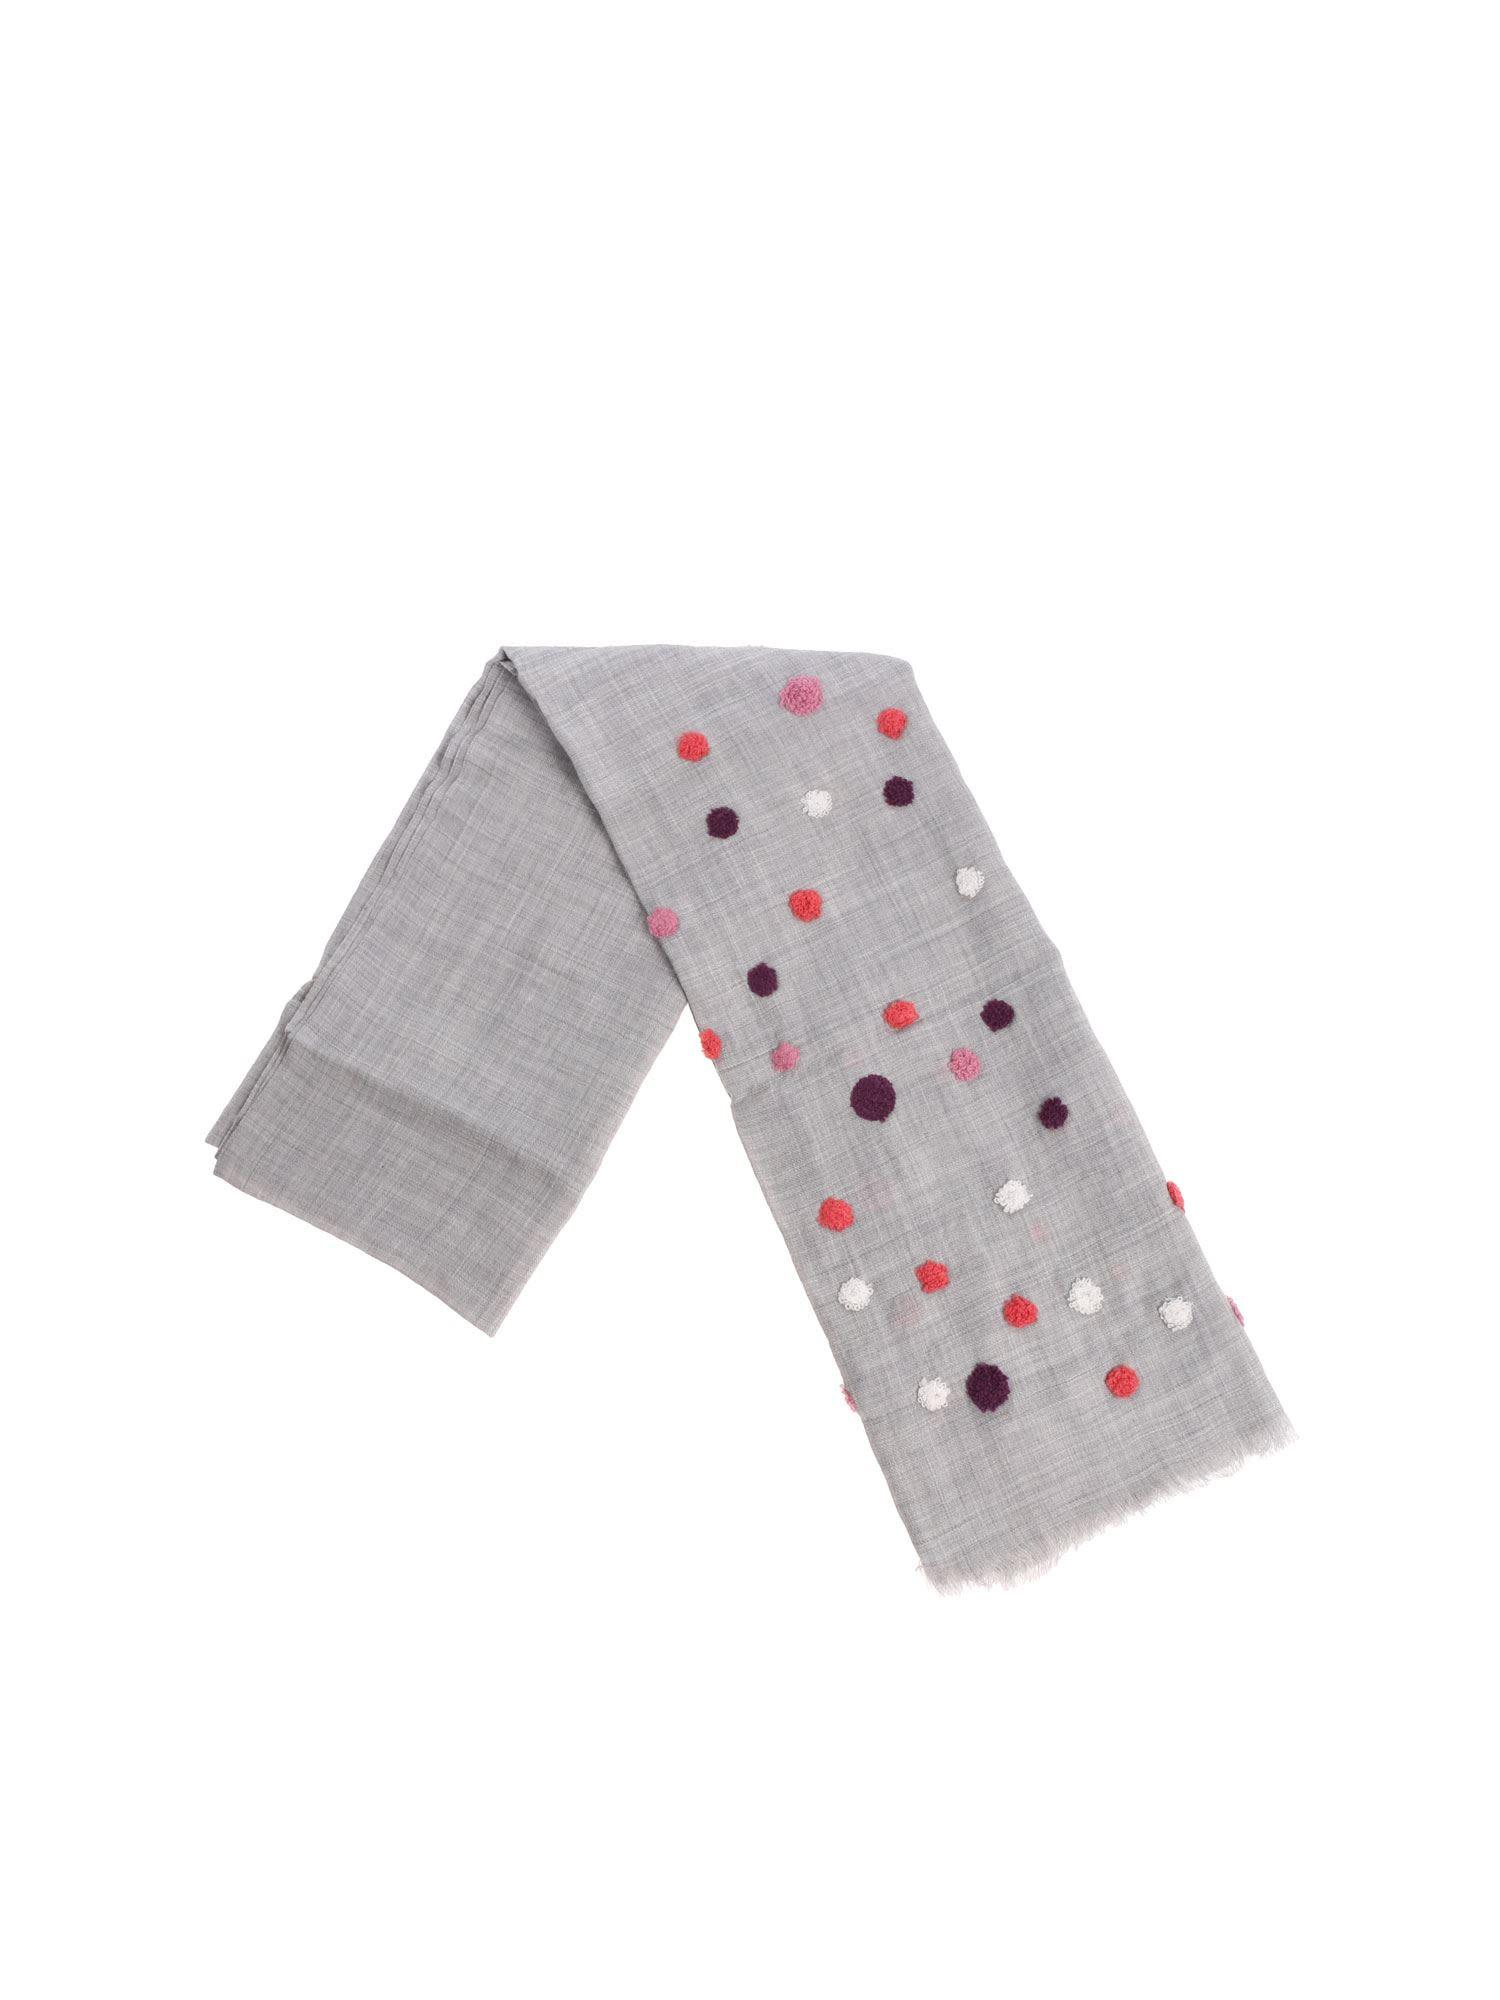 ALTEA Polka Dots Scarf in Grey